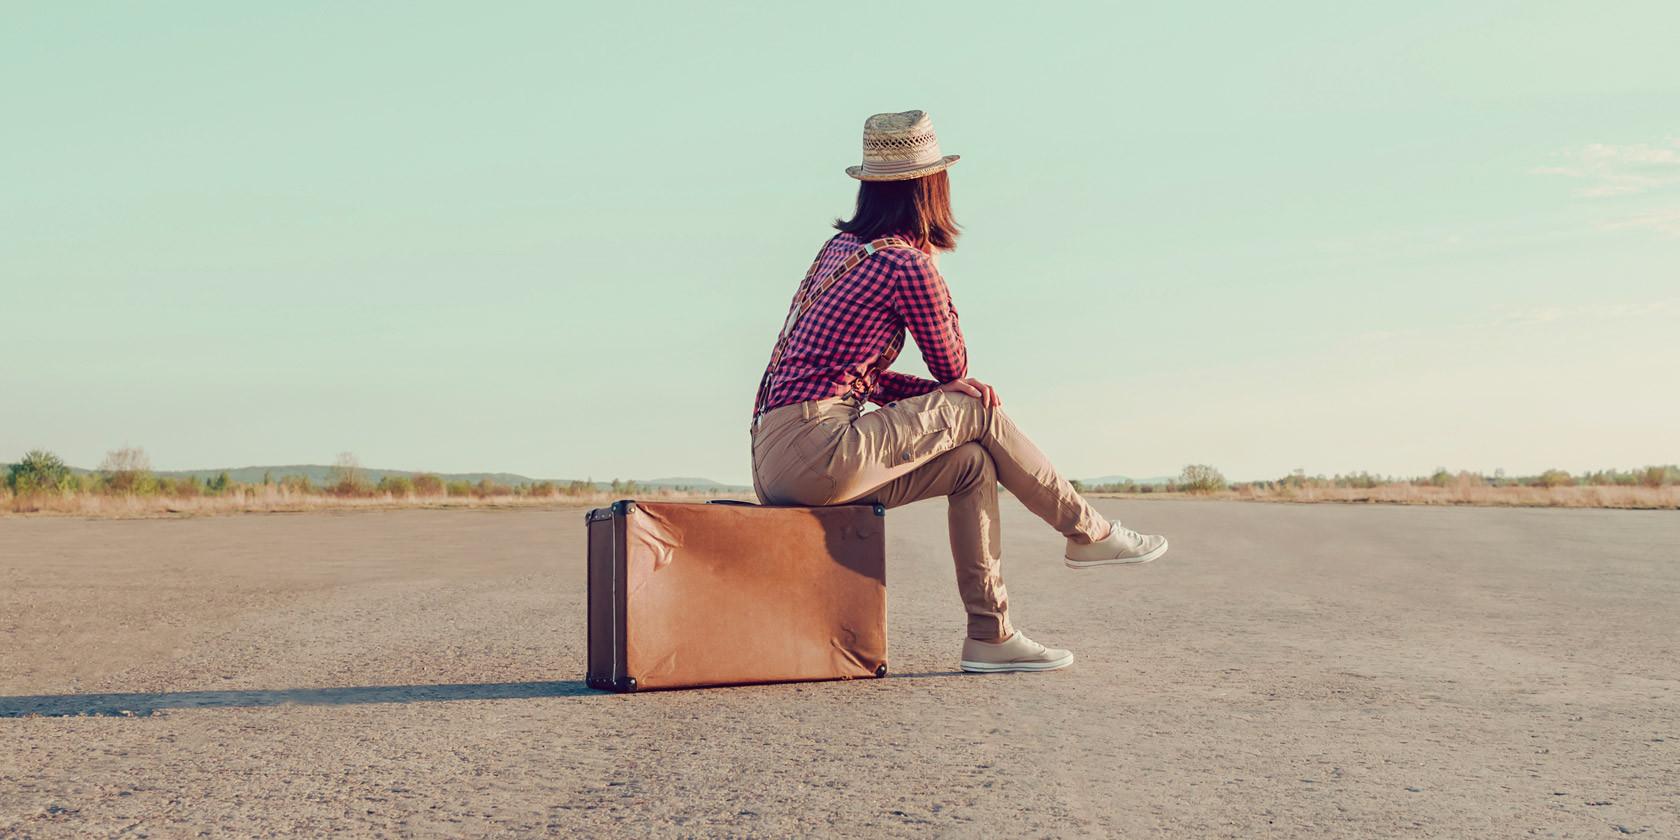 reisesets travel kits beauty